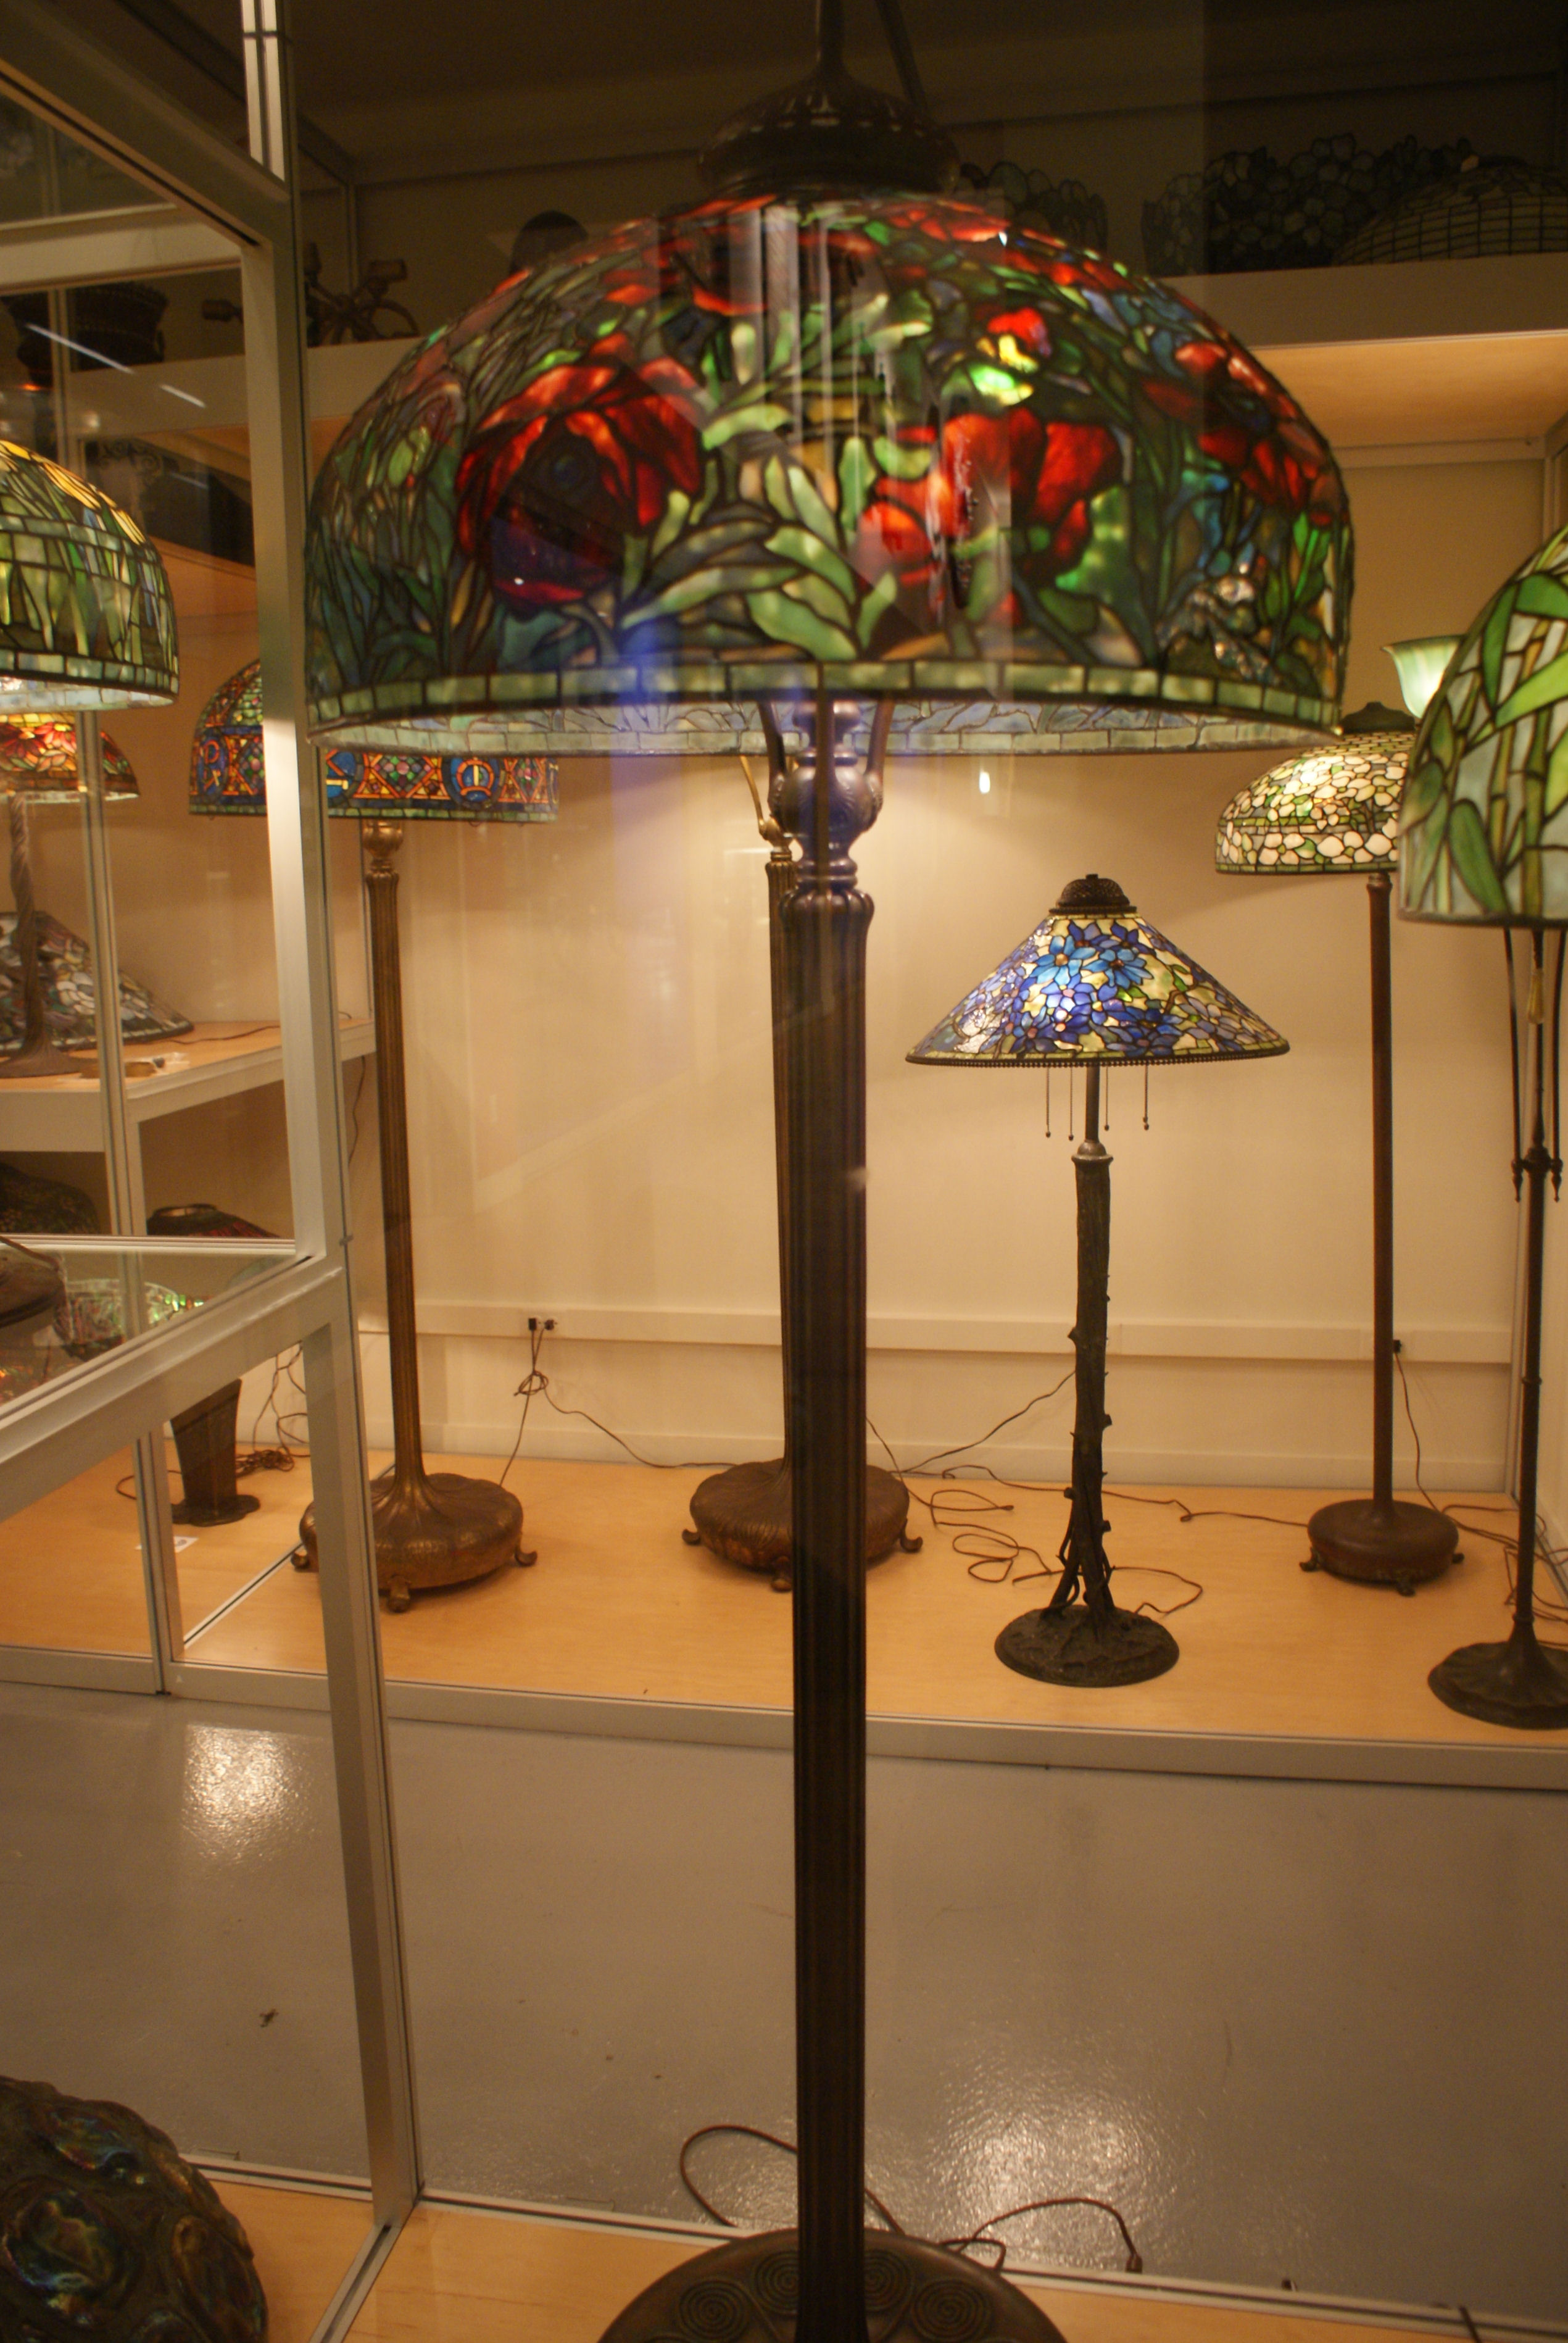 ... :WLA nyhistorical Tiffany Studios Red Oriental Poppy floor lamp.jpg